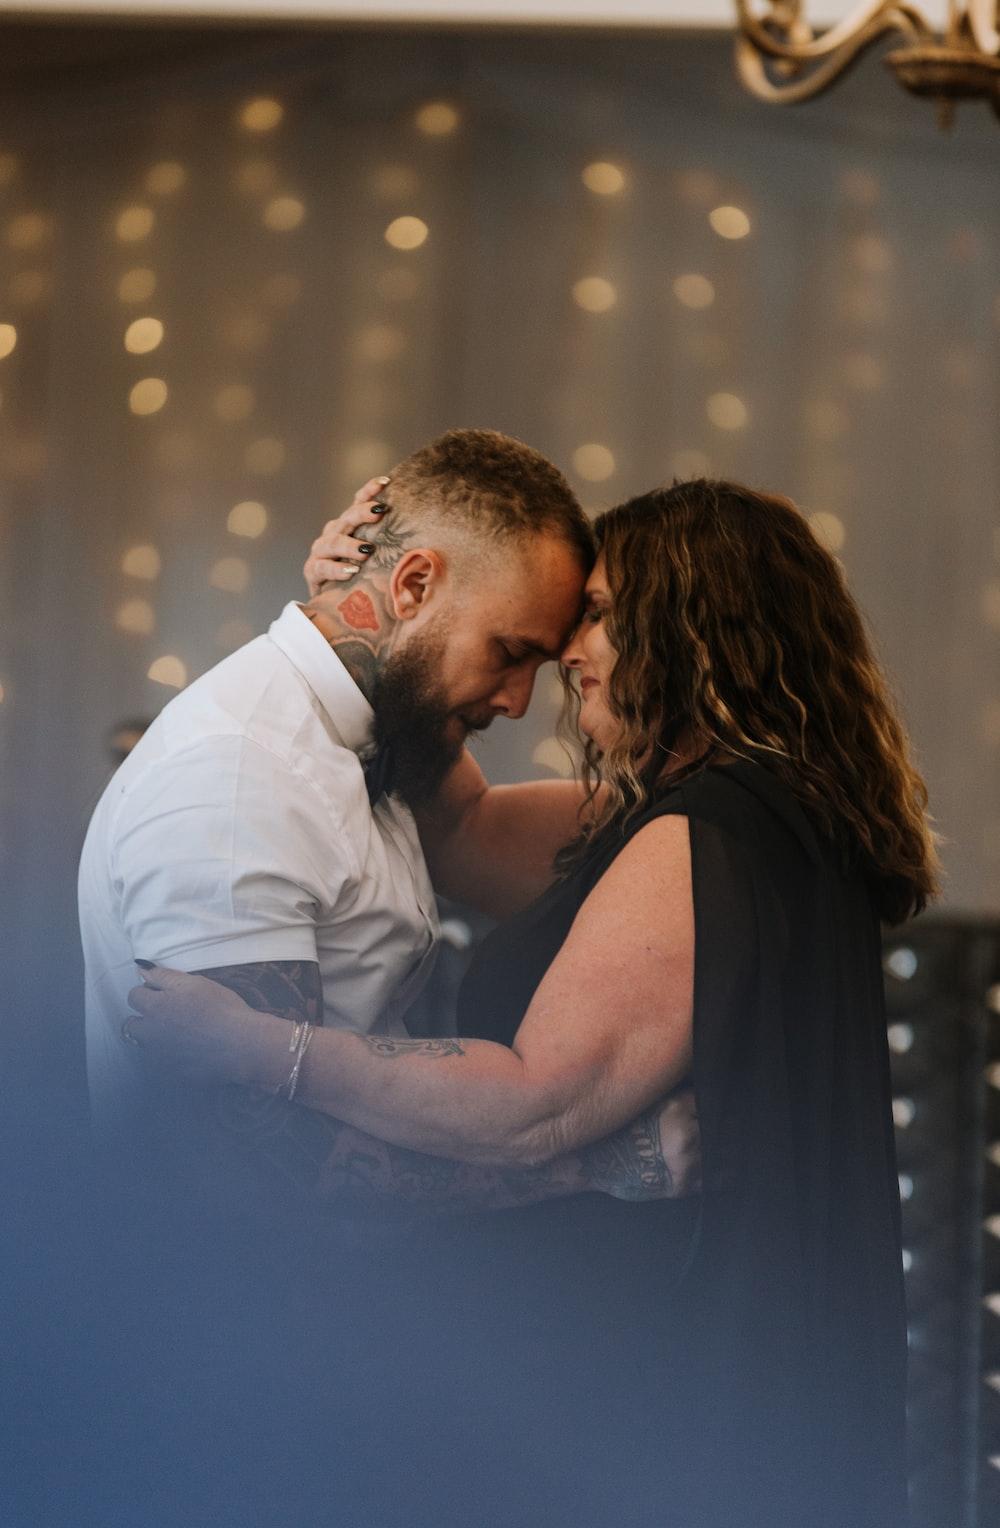 man in white dress shirt kissing woman in black sleeveless dress